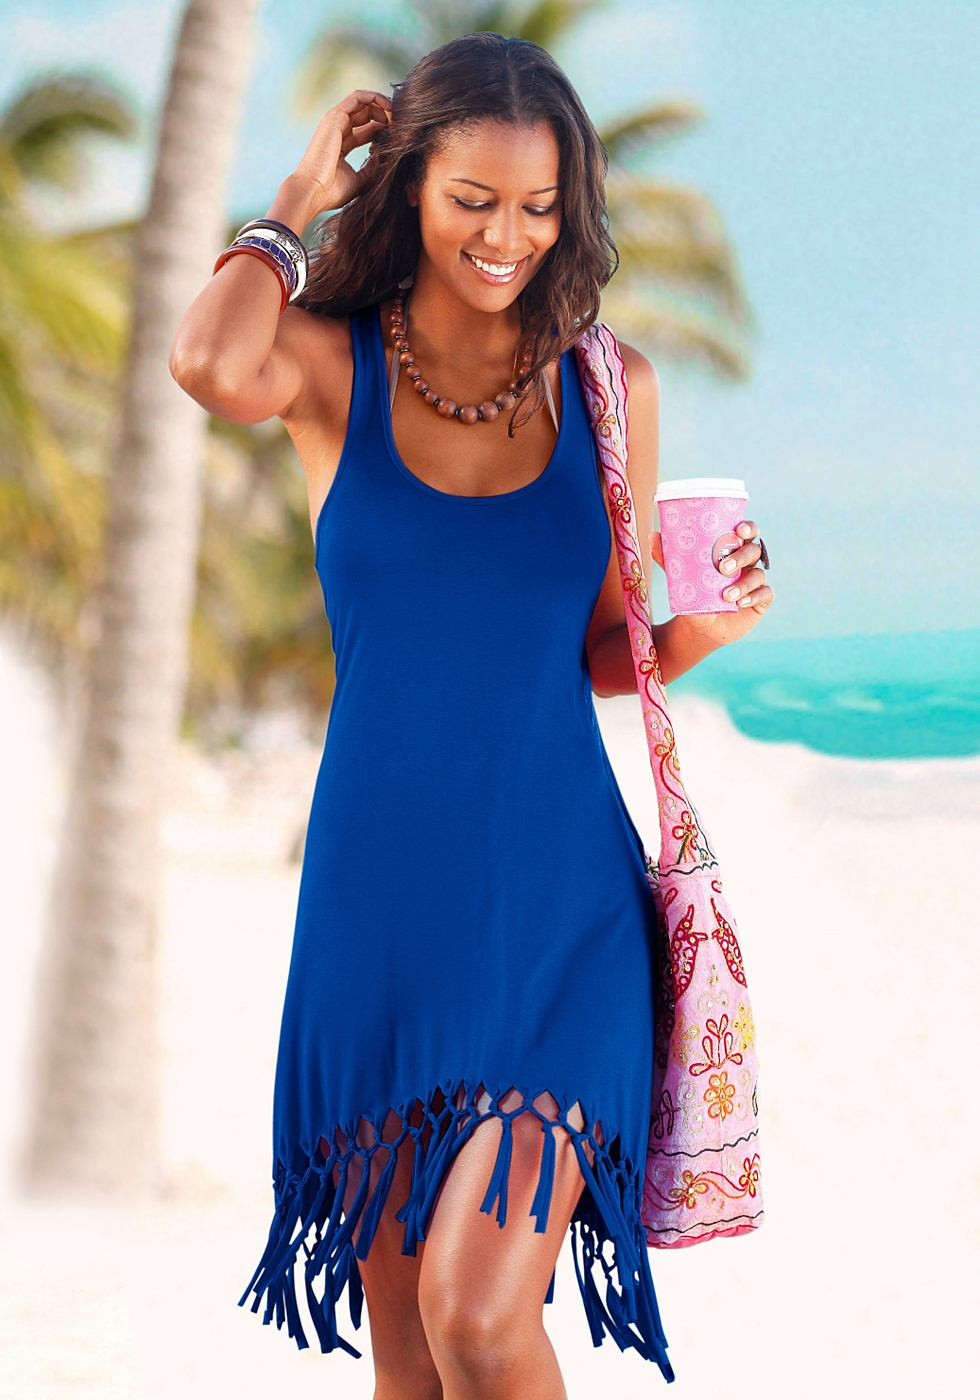 Beachtime Shirt in lang model blauw